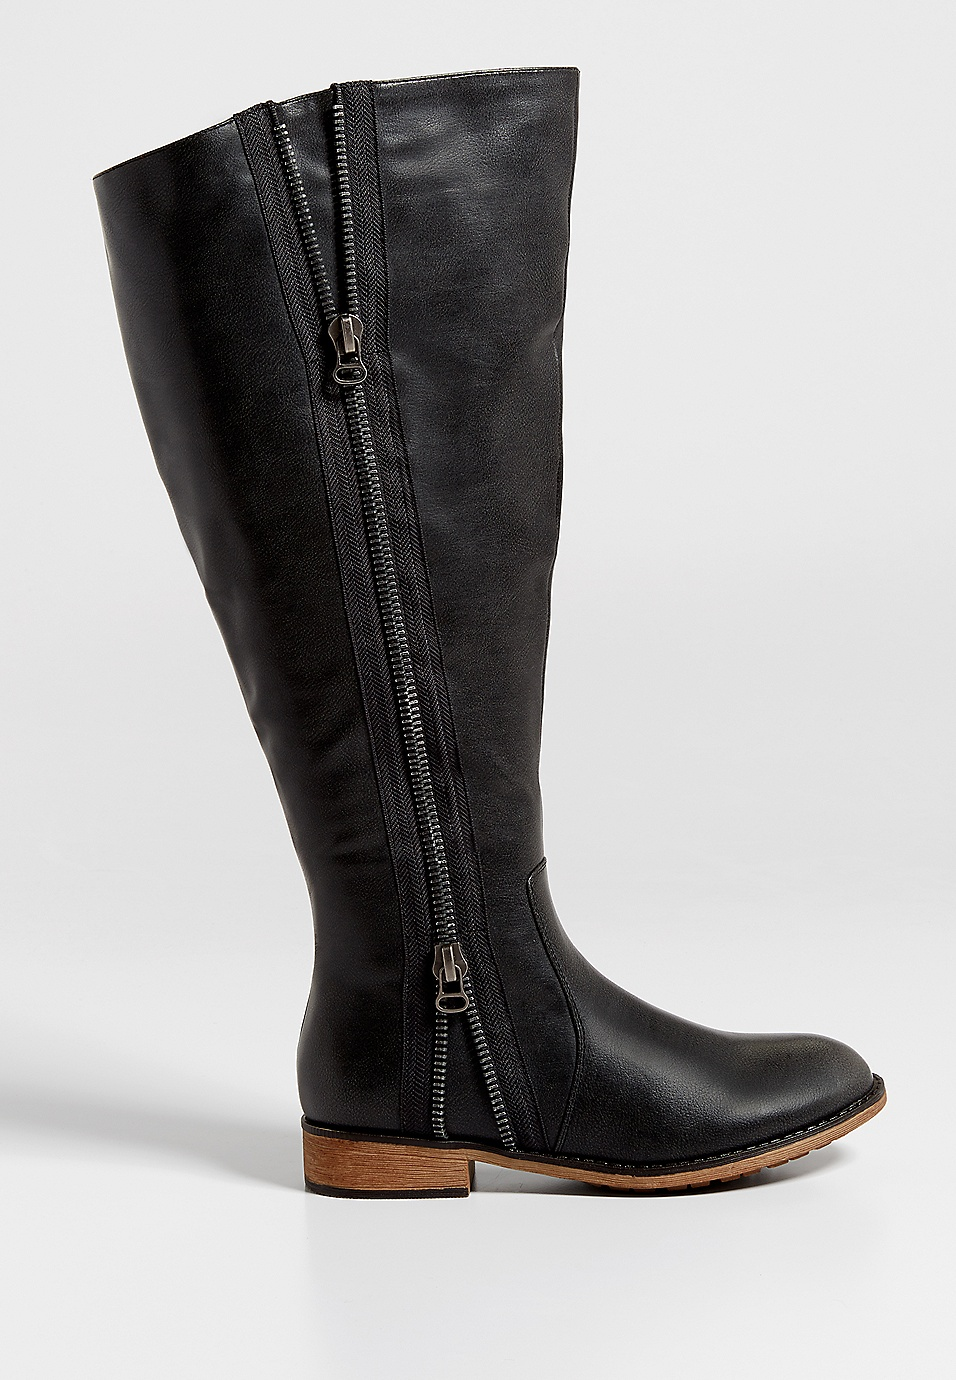 d145de0314f Lisa extra wide calf boot with side zipper